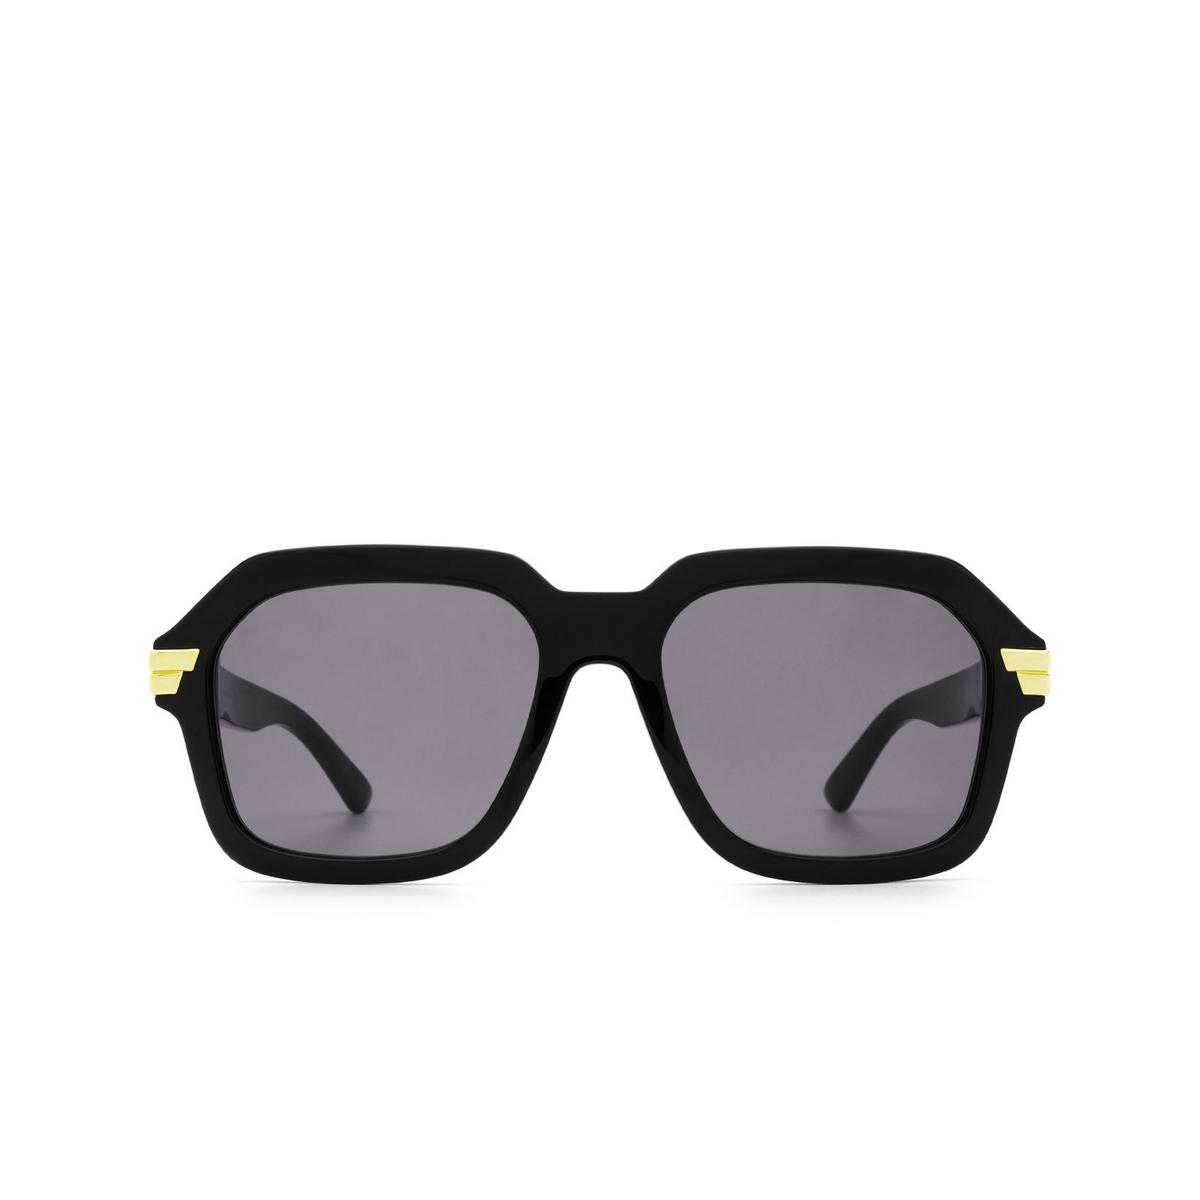 Bottega Veneta® Square Sunglasses: BV1123S color Black 001 - front view.